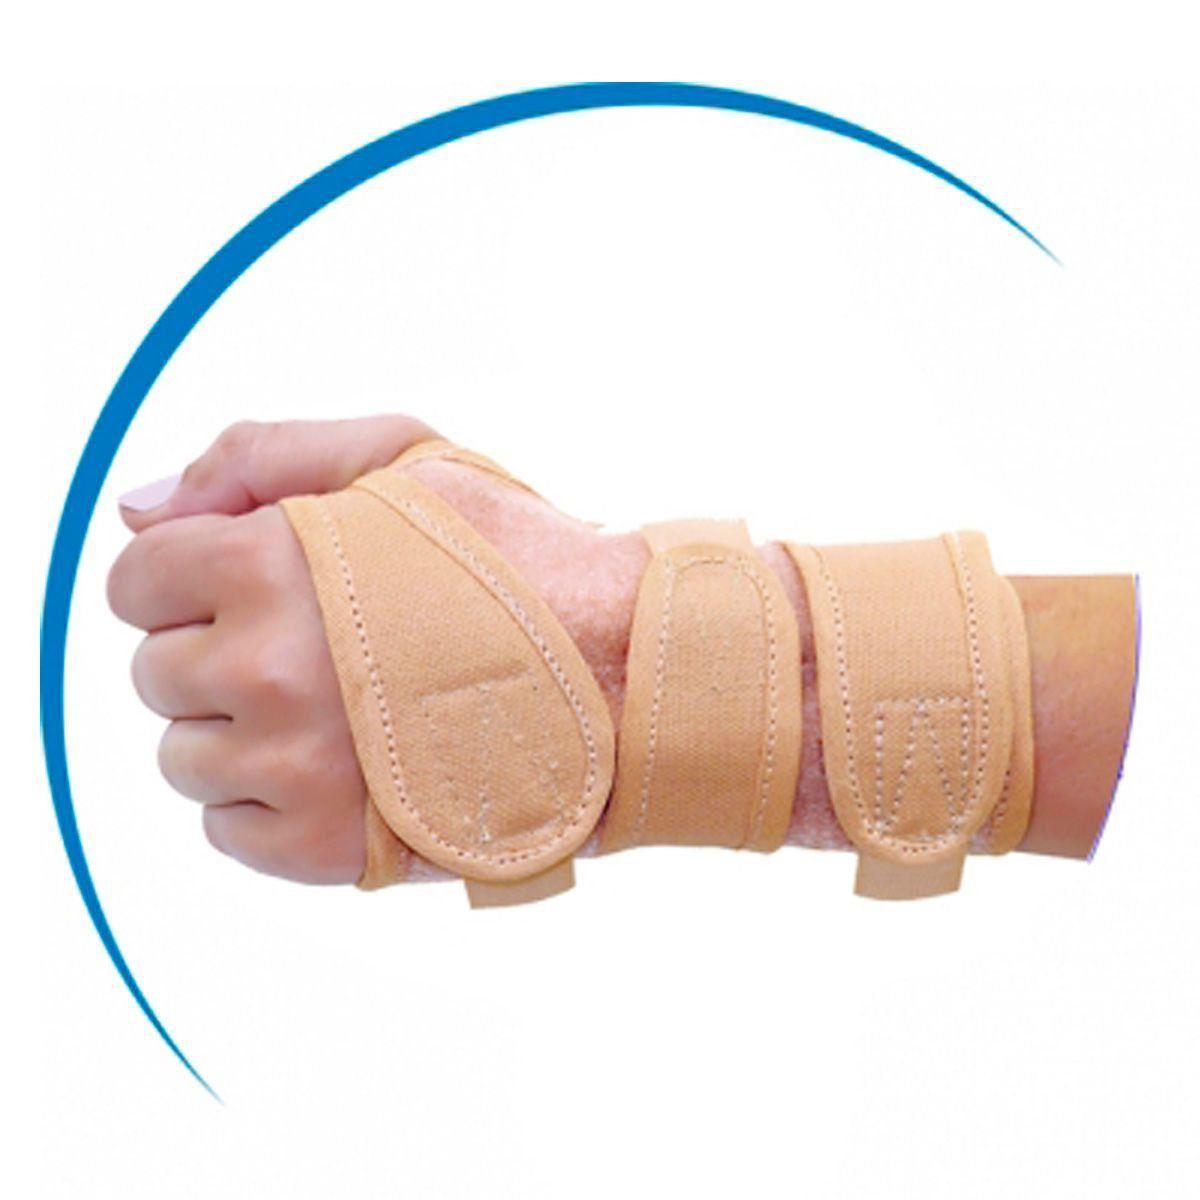 Mini Tala Lona Bege Mão Direita Pequena - Take Care